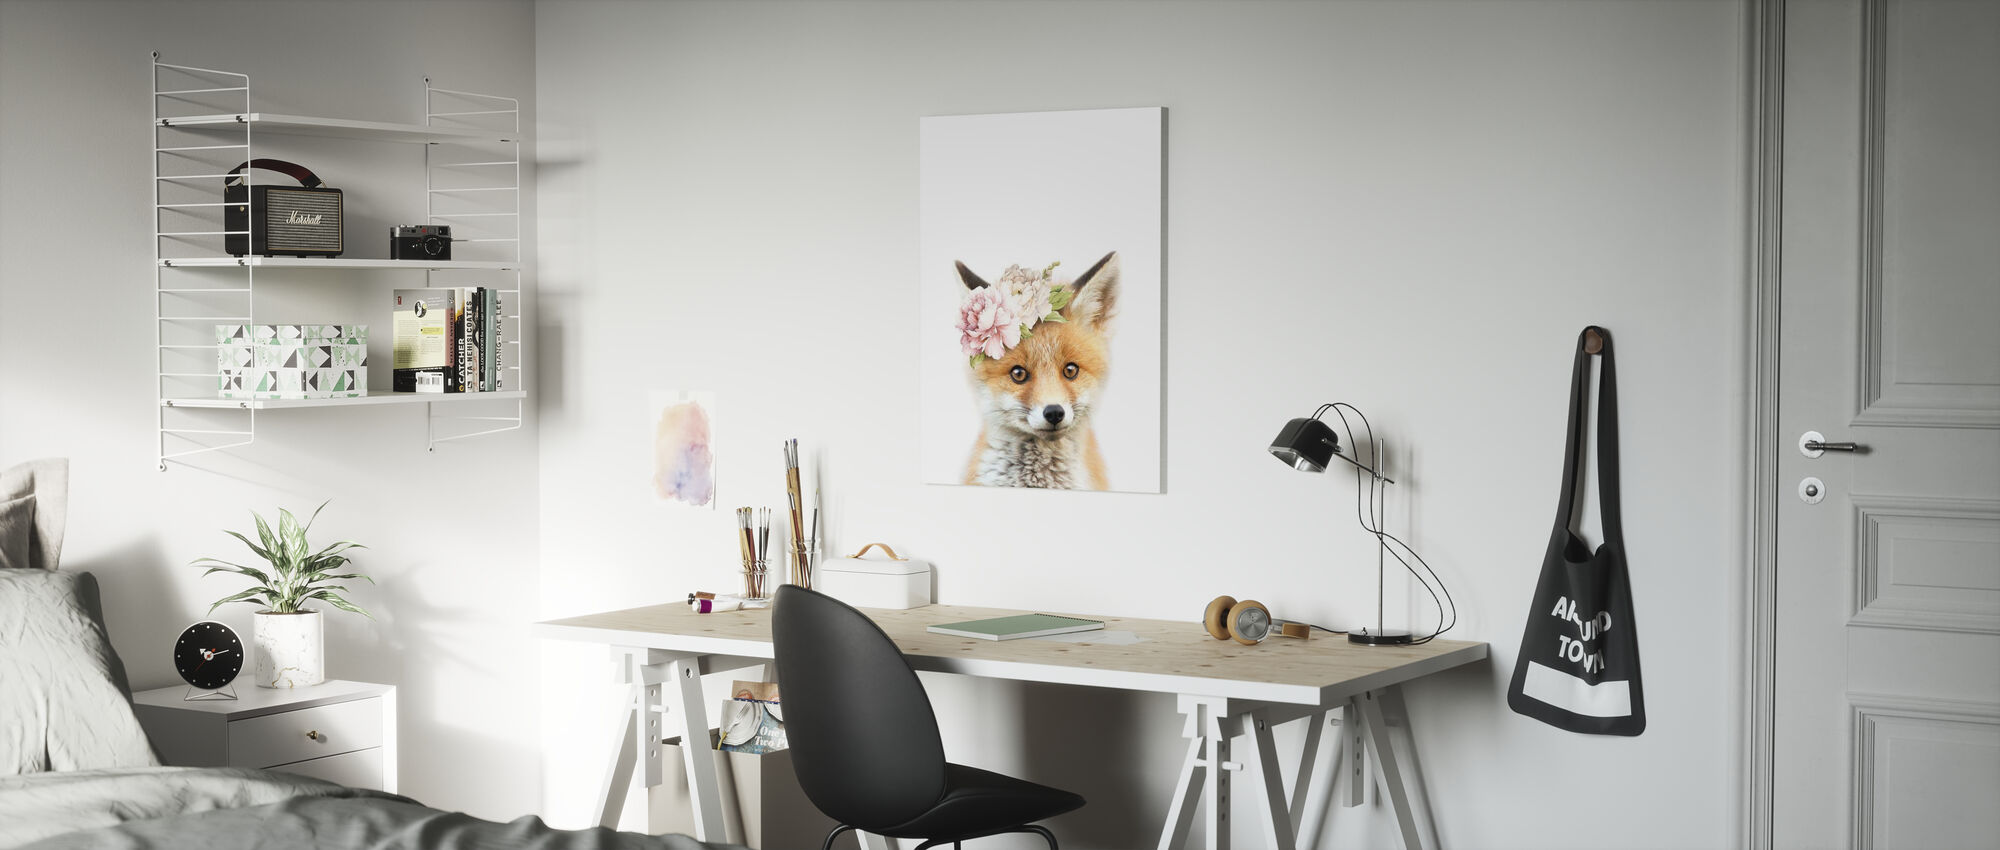 Floral Fox - Canvas print - Kids Room